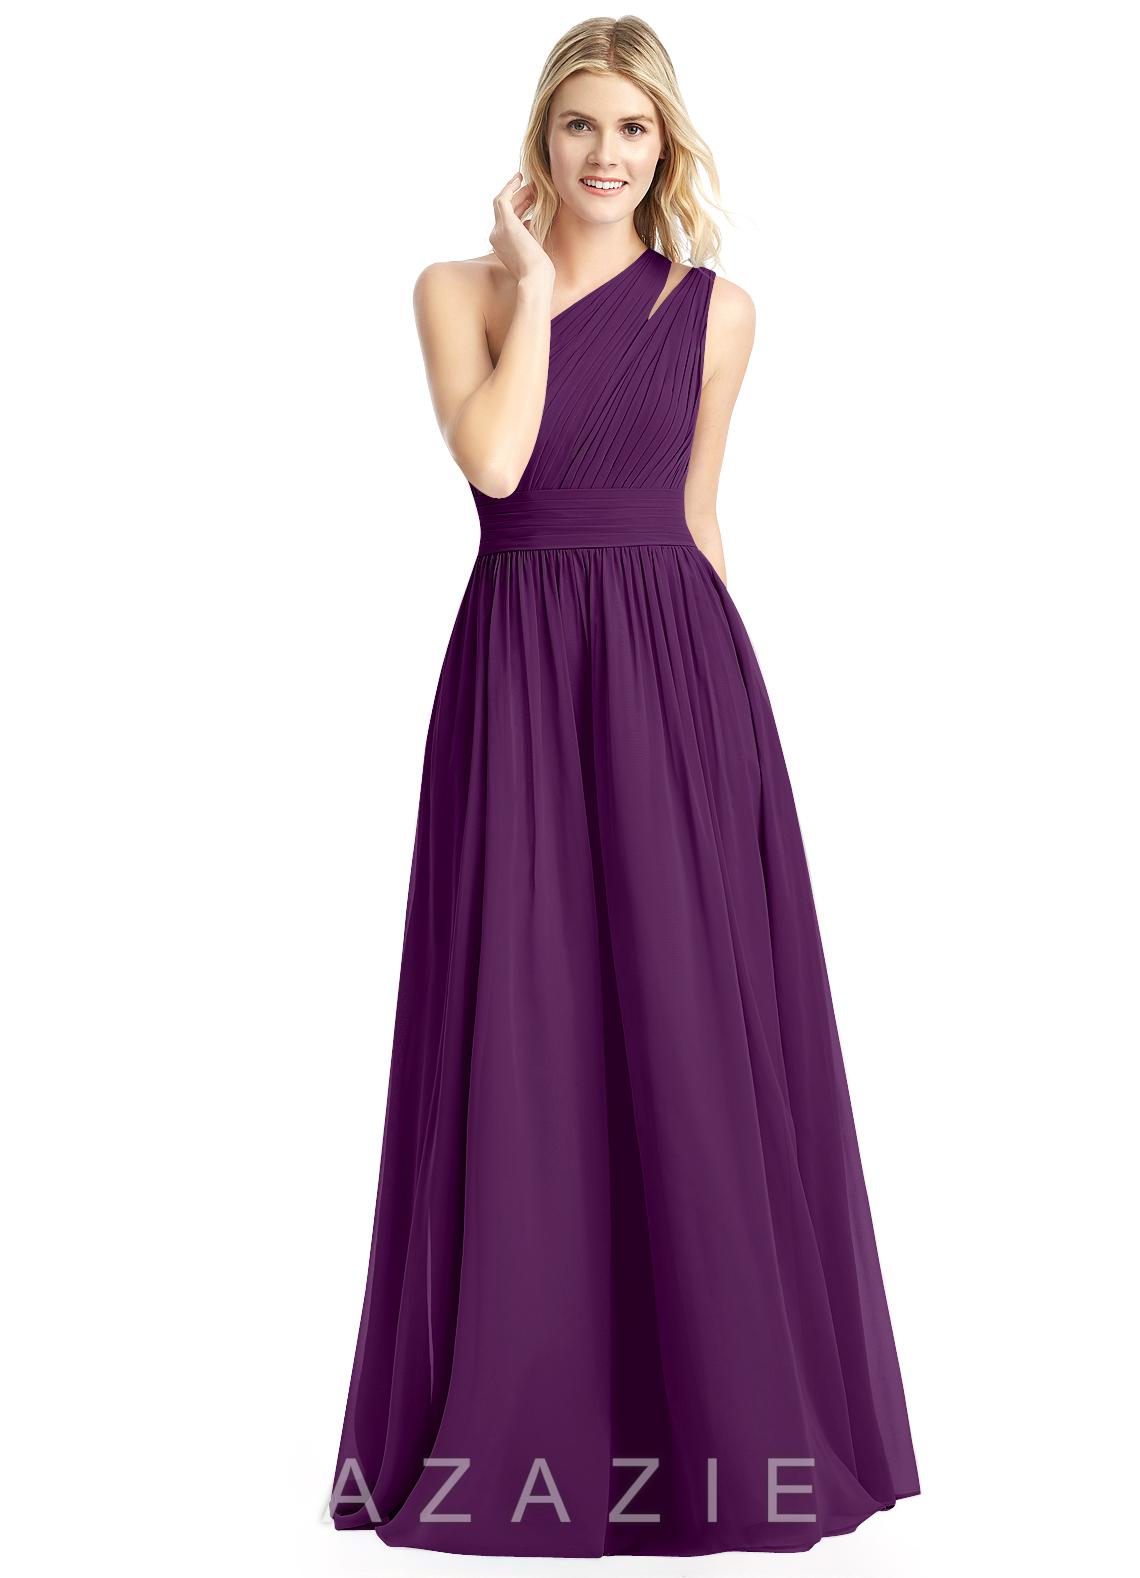 Grape Purple Bridesmaid Dresses